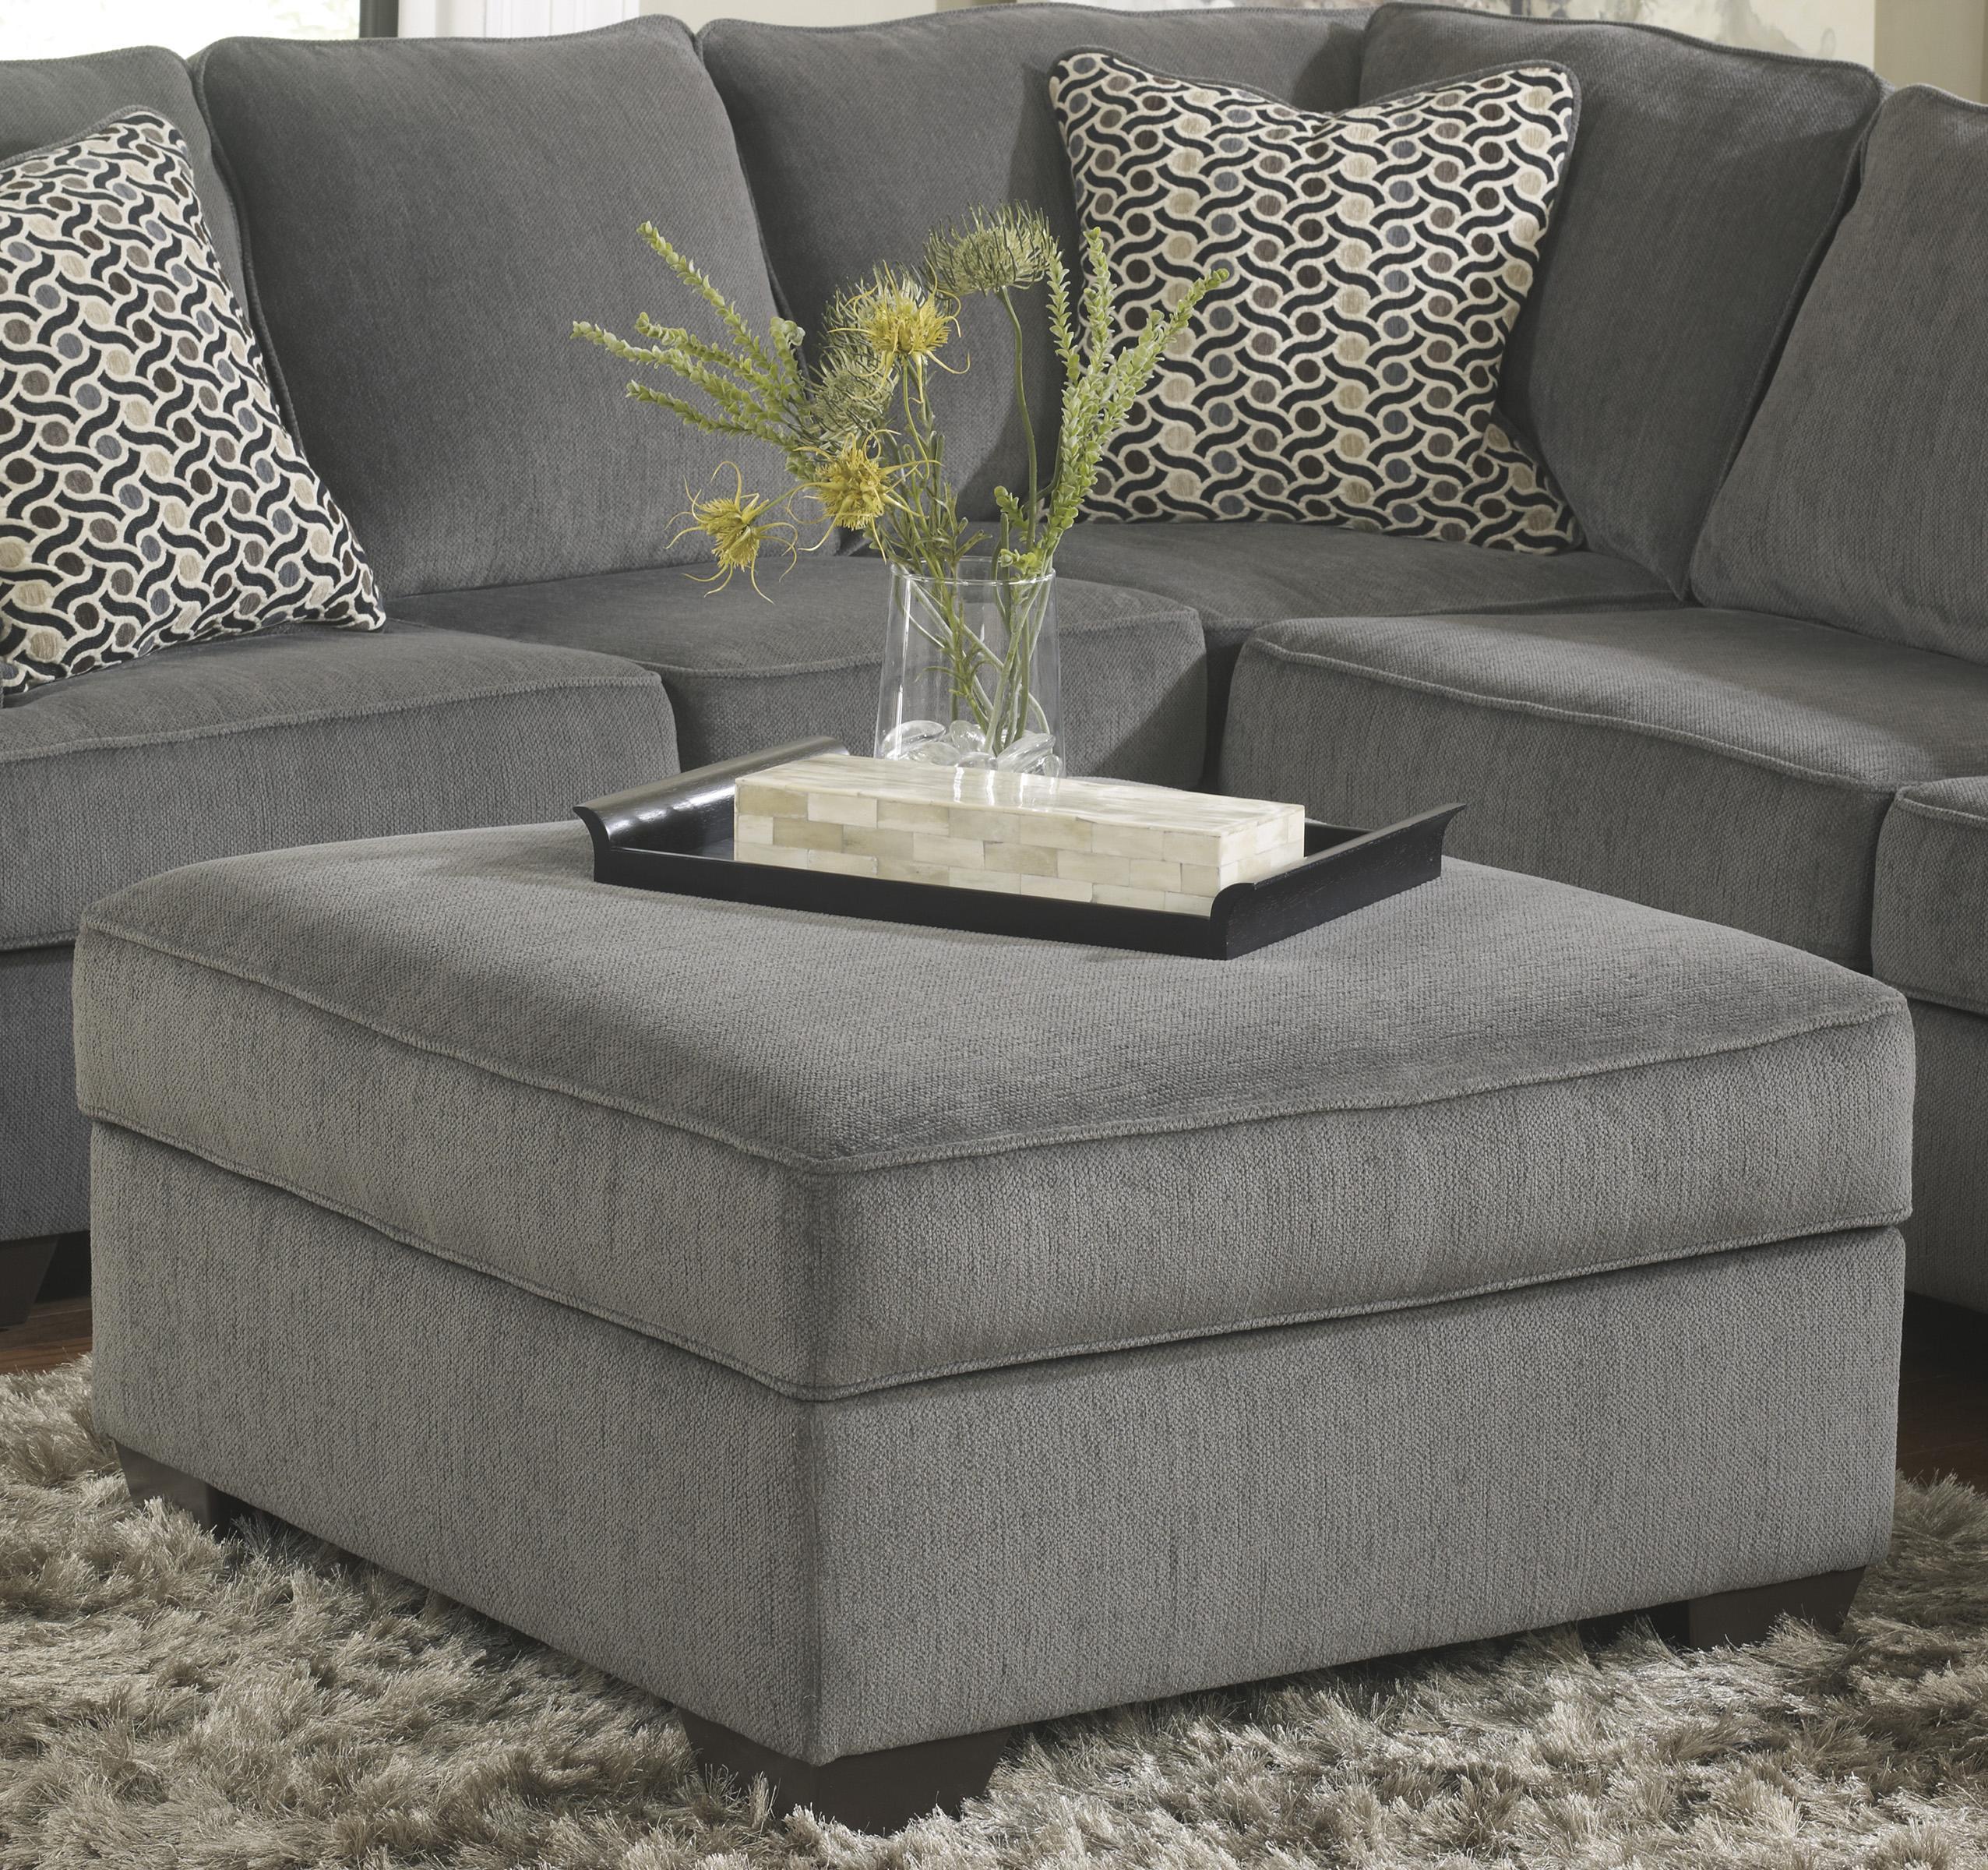 Loric - Smoke Ottoman With Storage by Ashley Furniture at Lapeer Furniture & Mattress Center